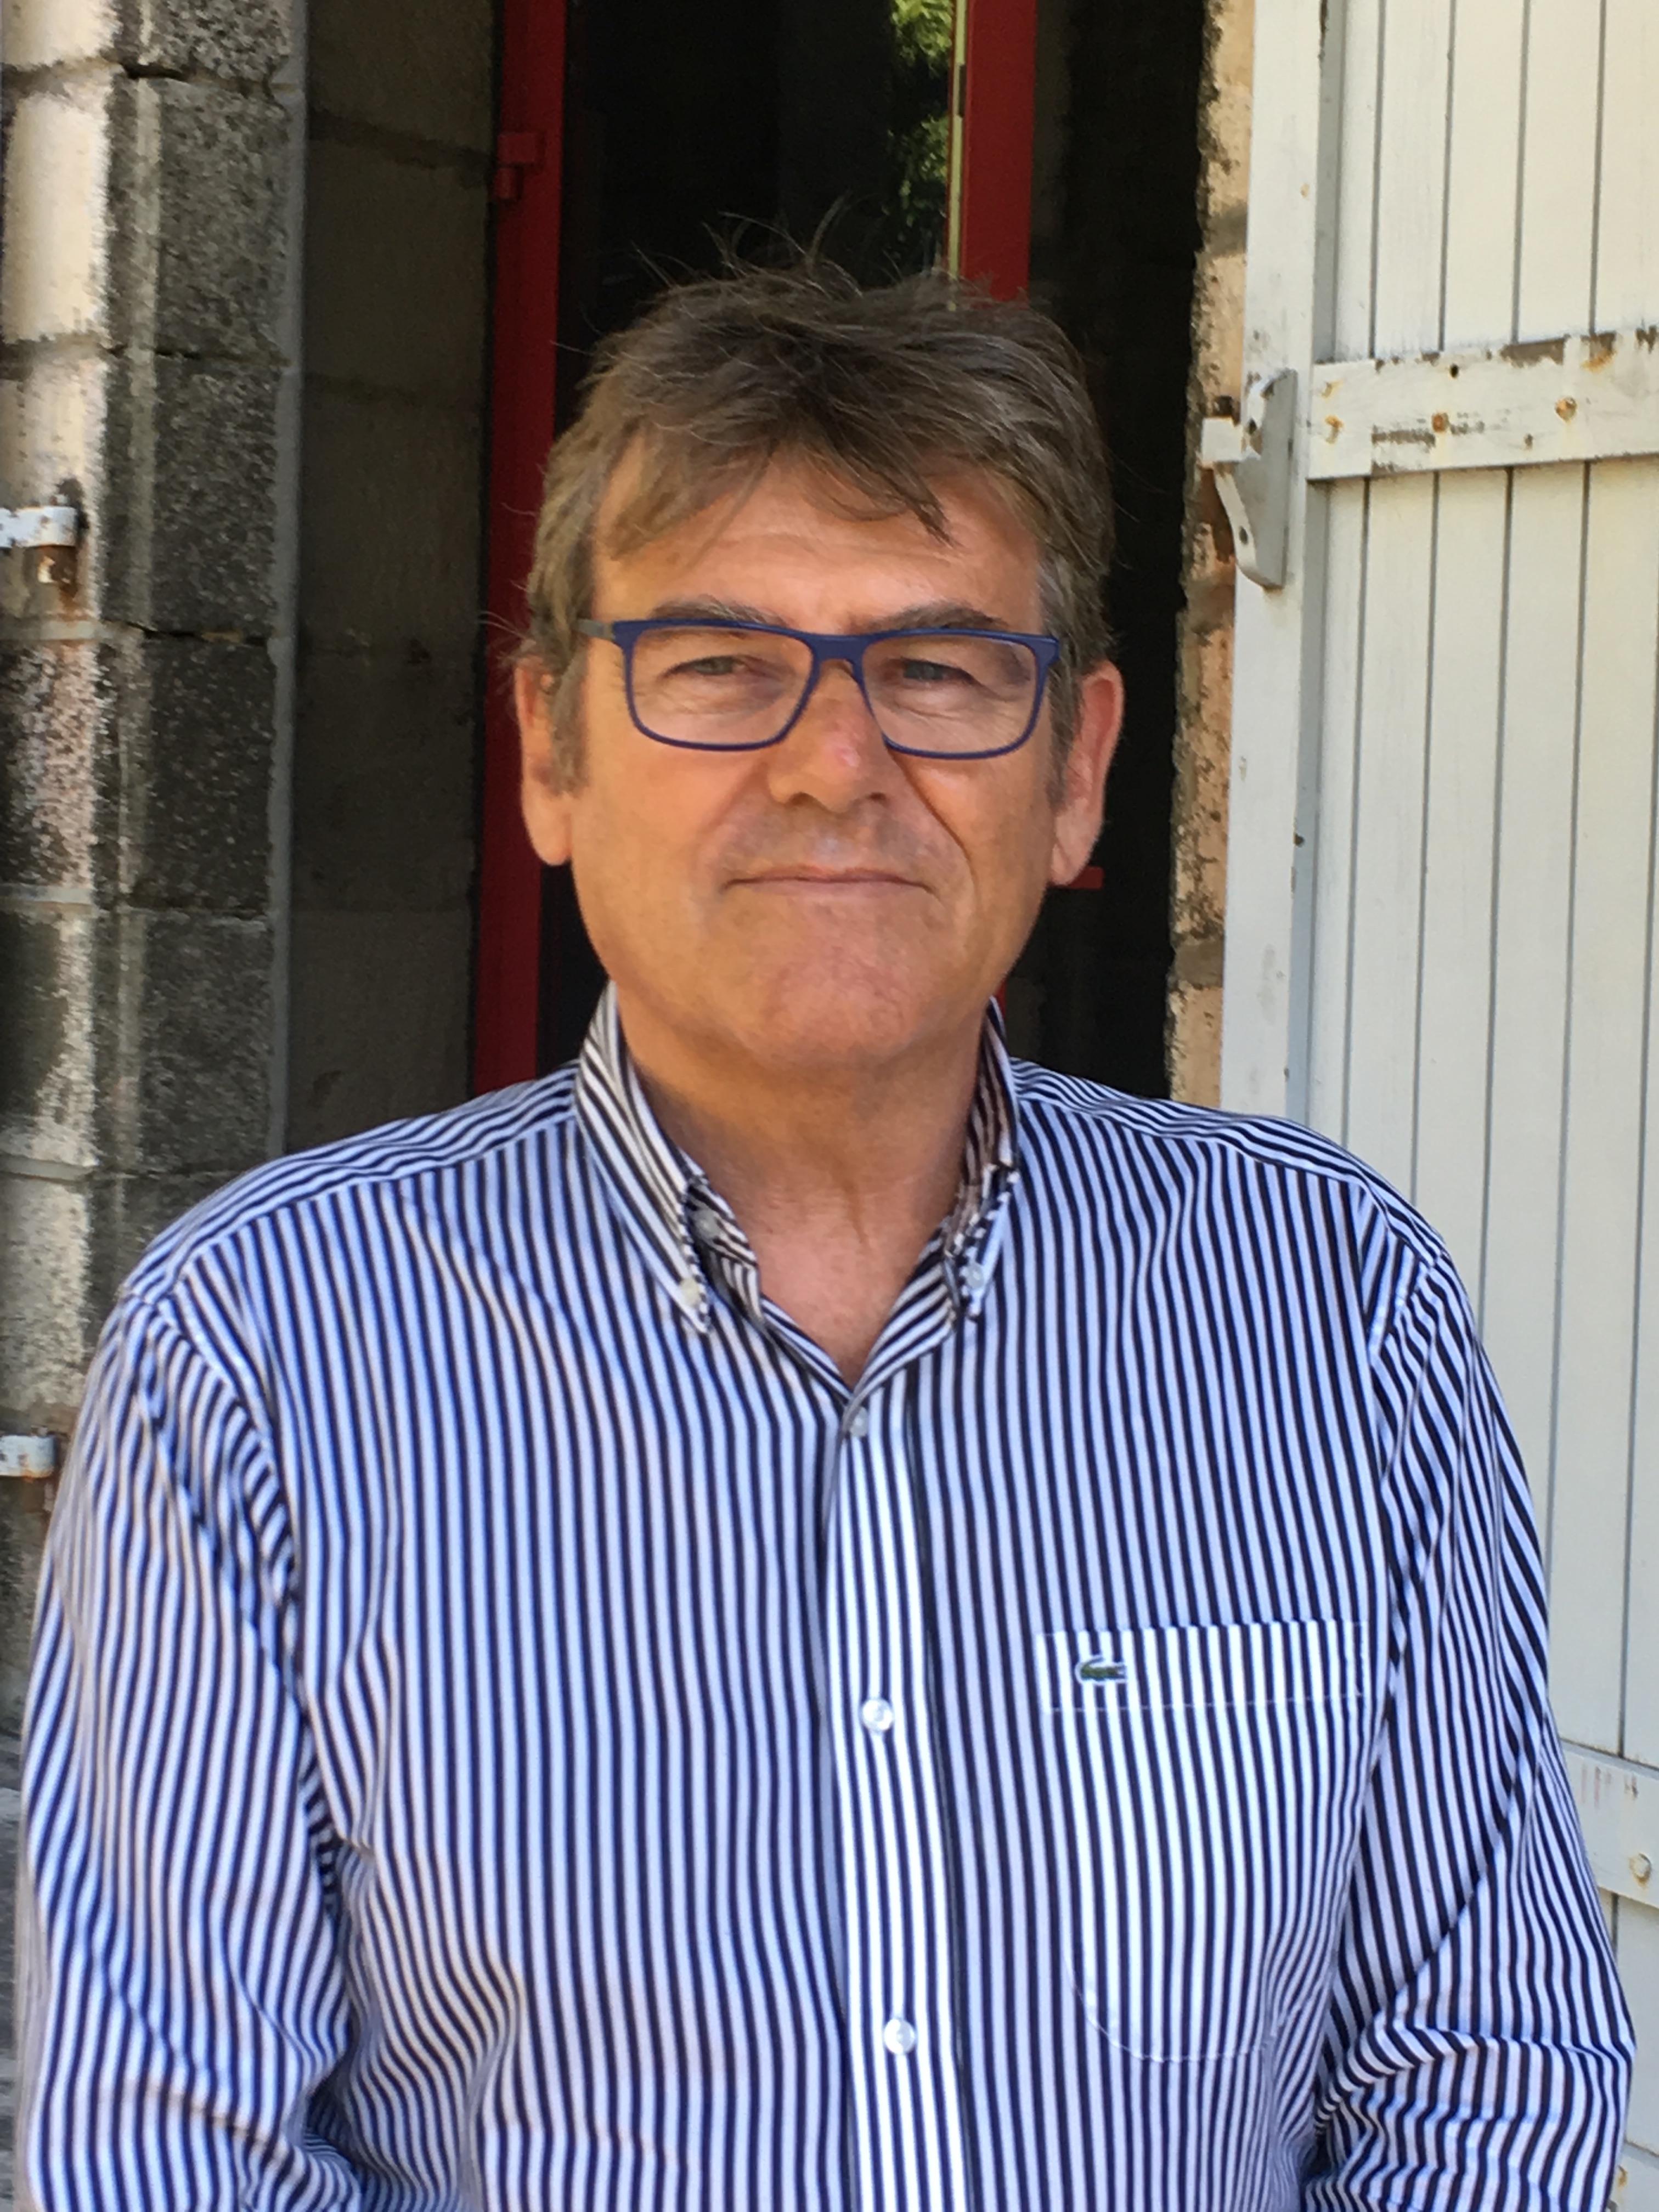 Patrick Gras